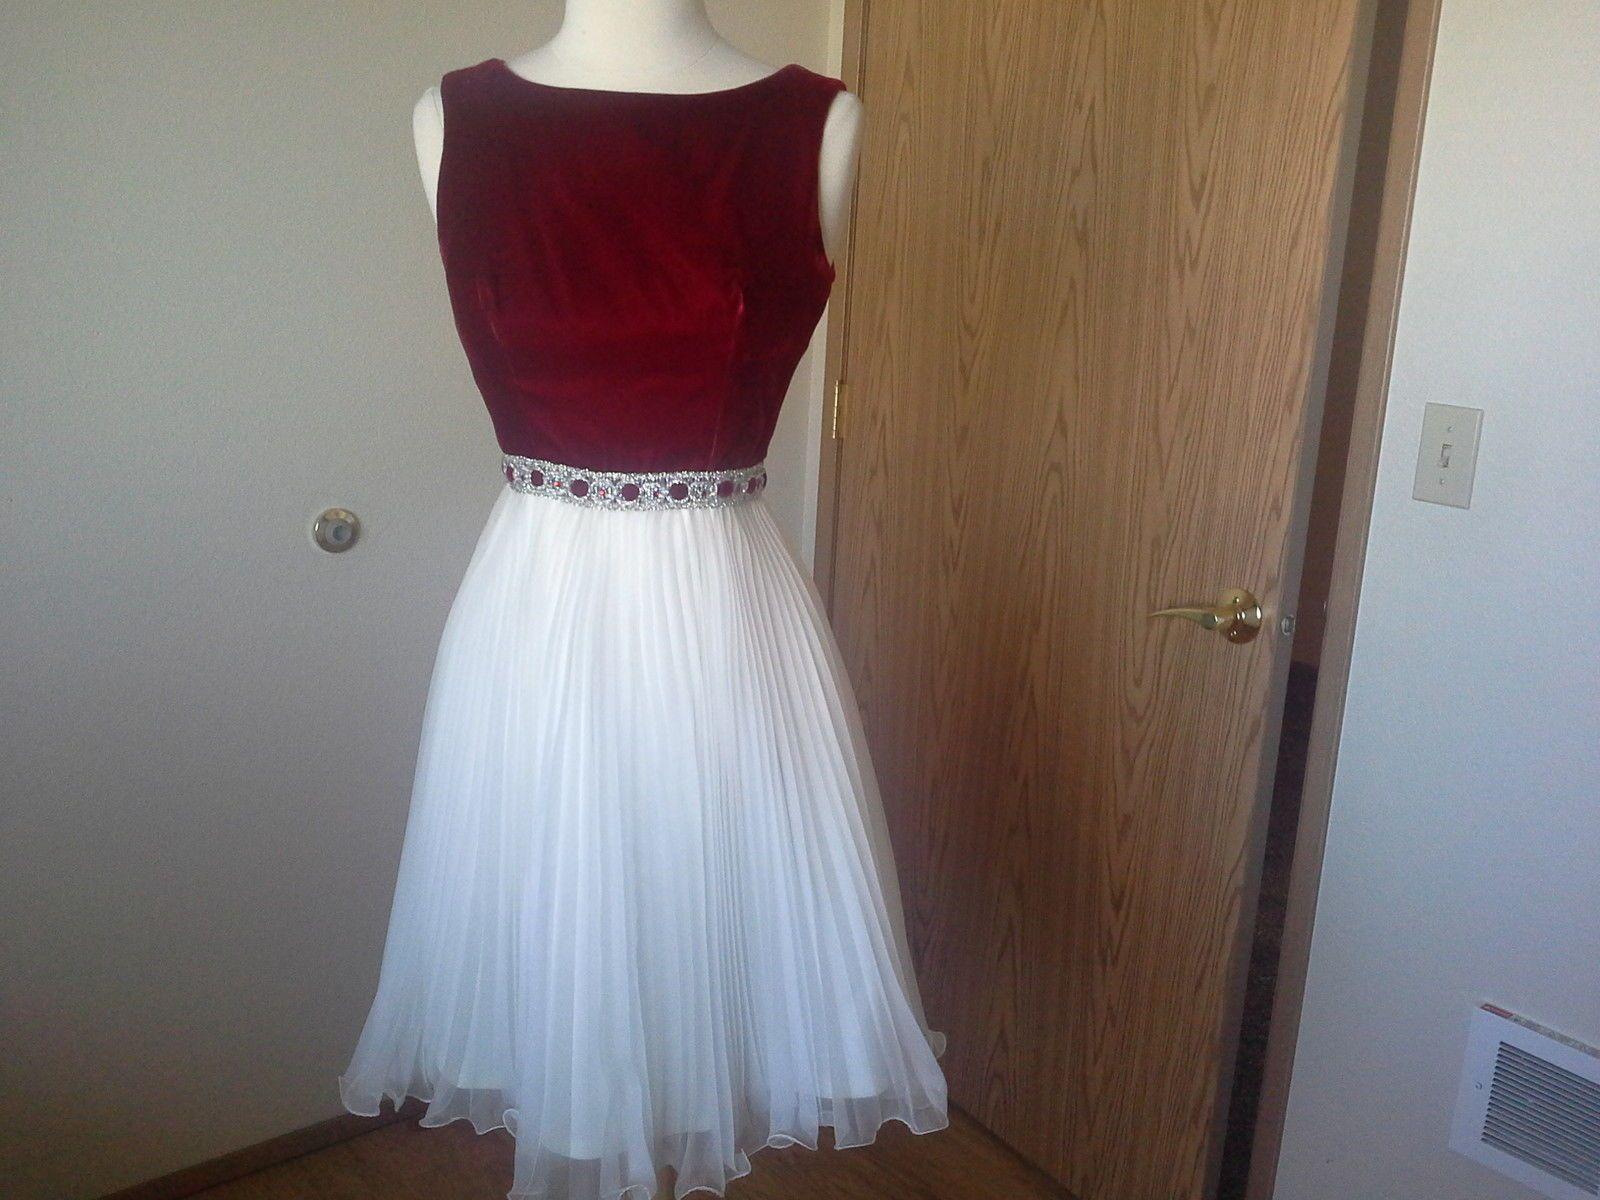 Vtg s red velvet white chiffon accordian pleat skirt prom party